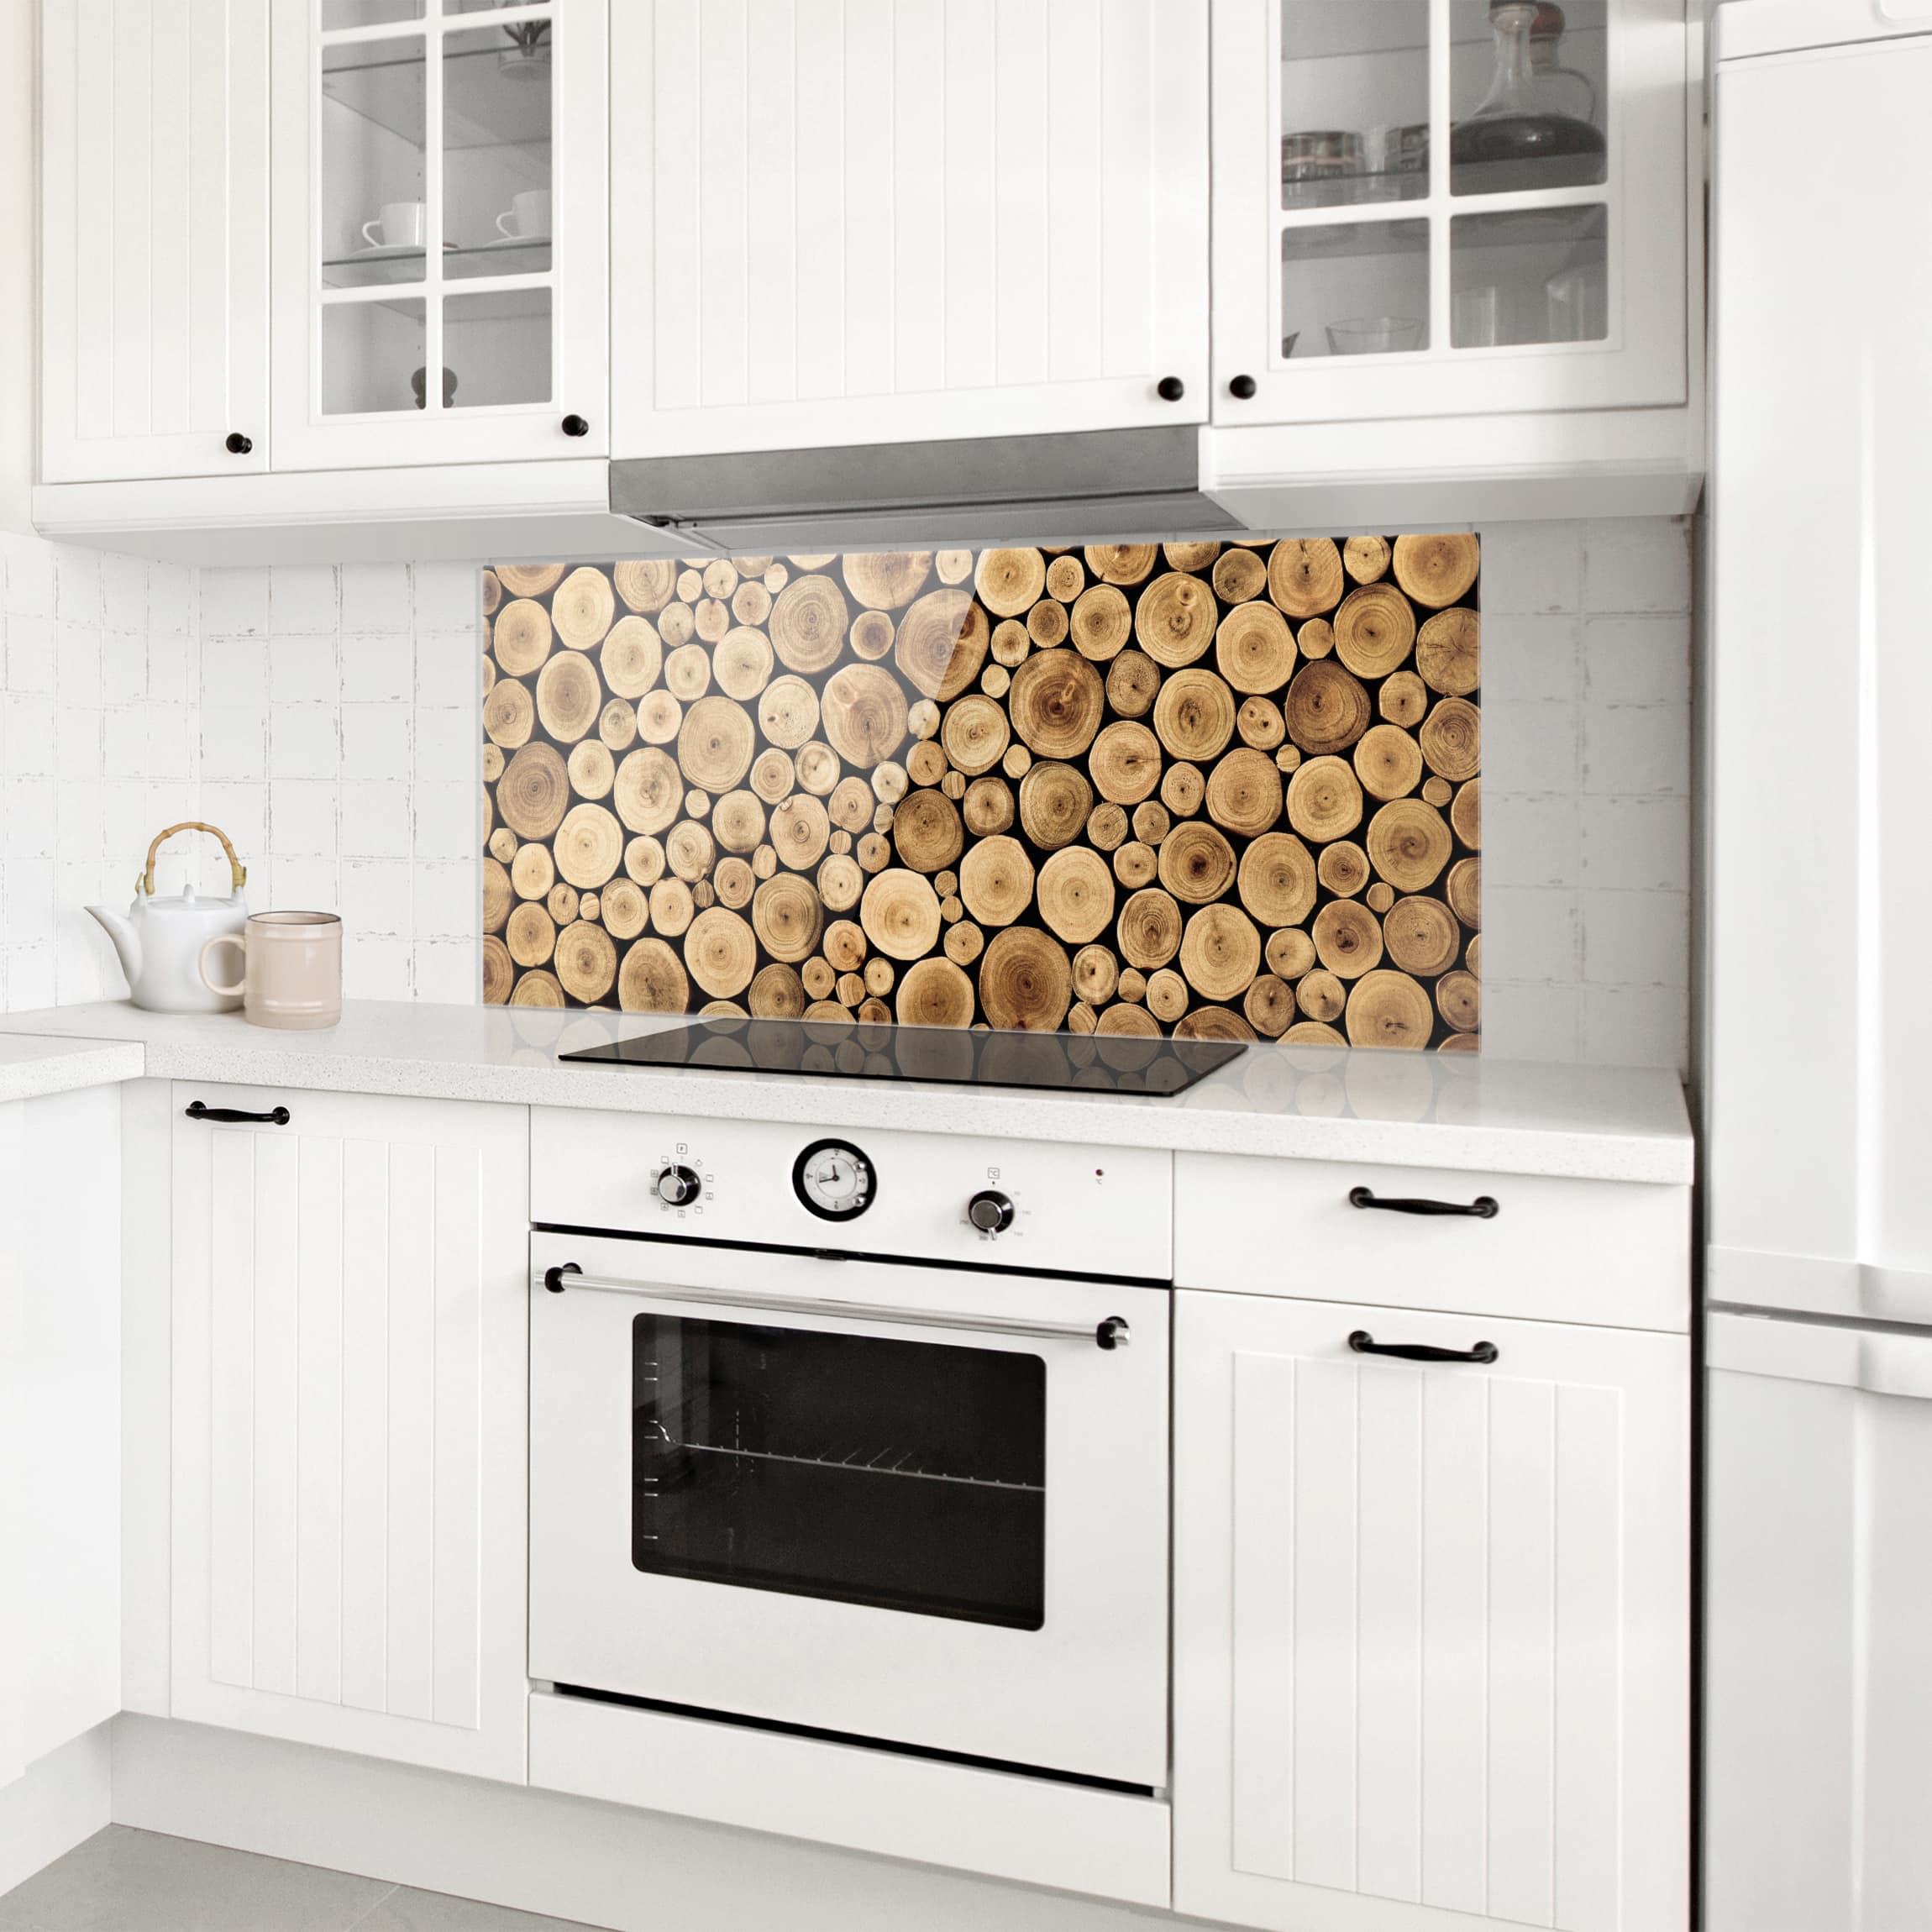 spritzschutz glas homey firewood panorama quer. Black Bedroom Furniture Sets. Home Design Ideas